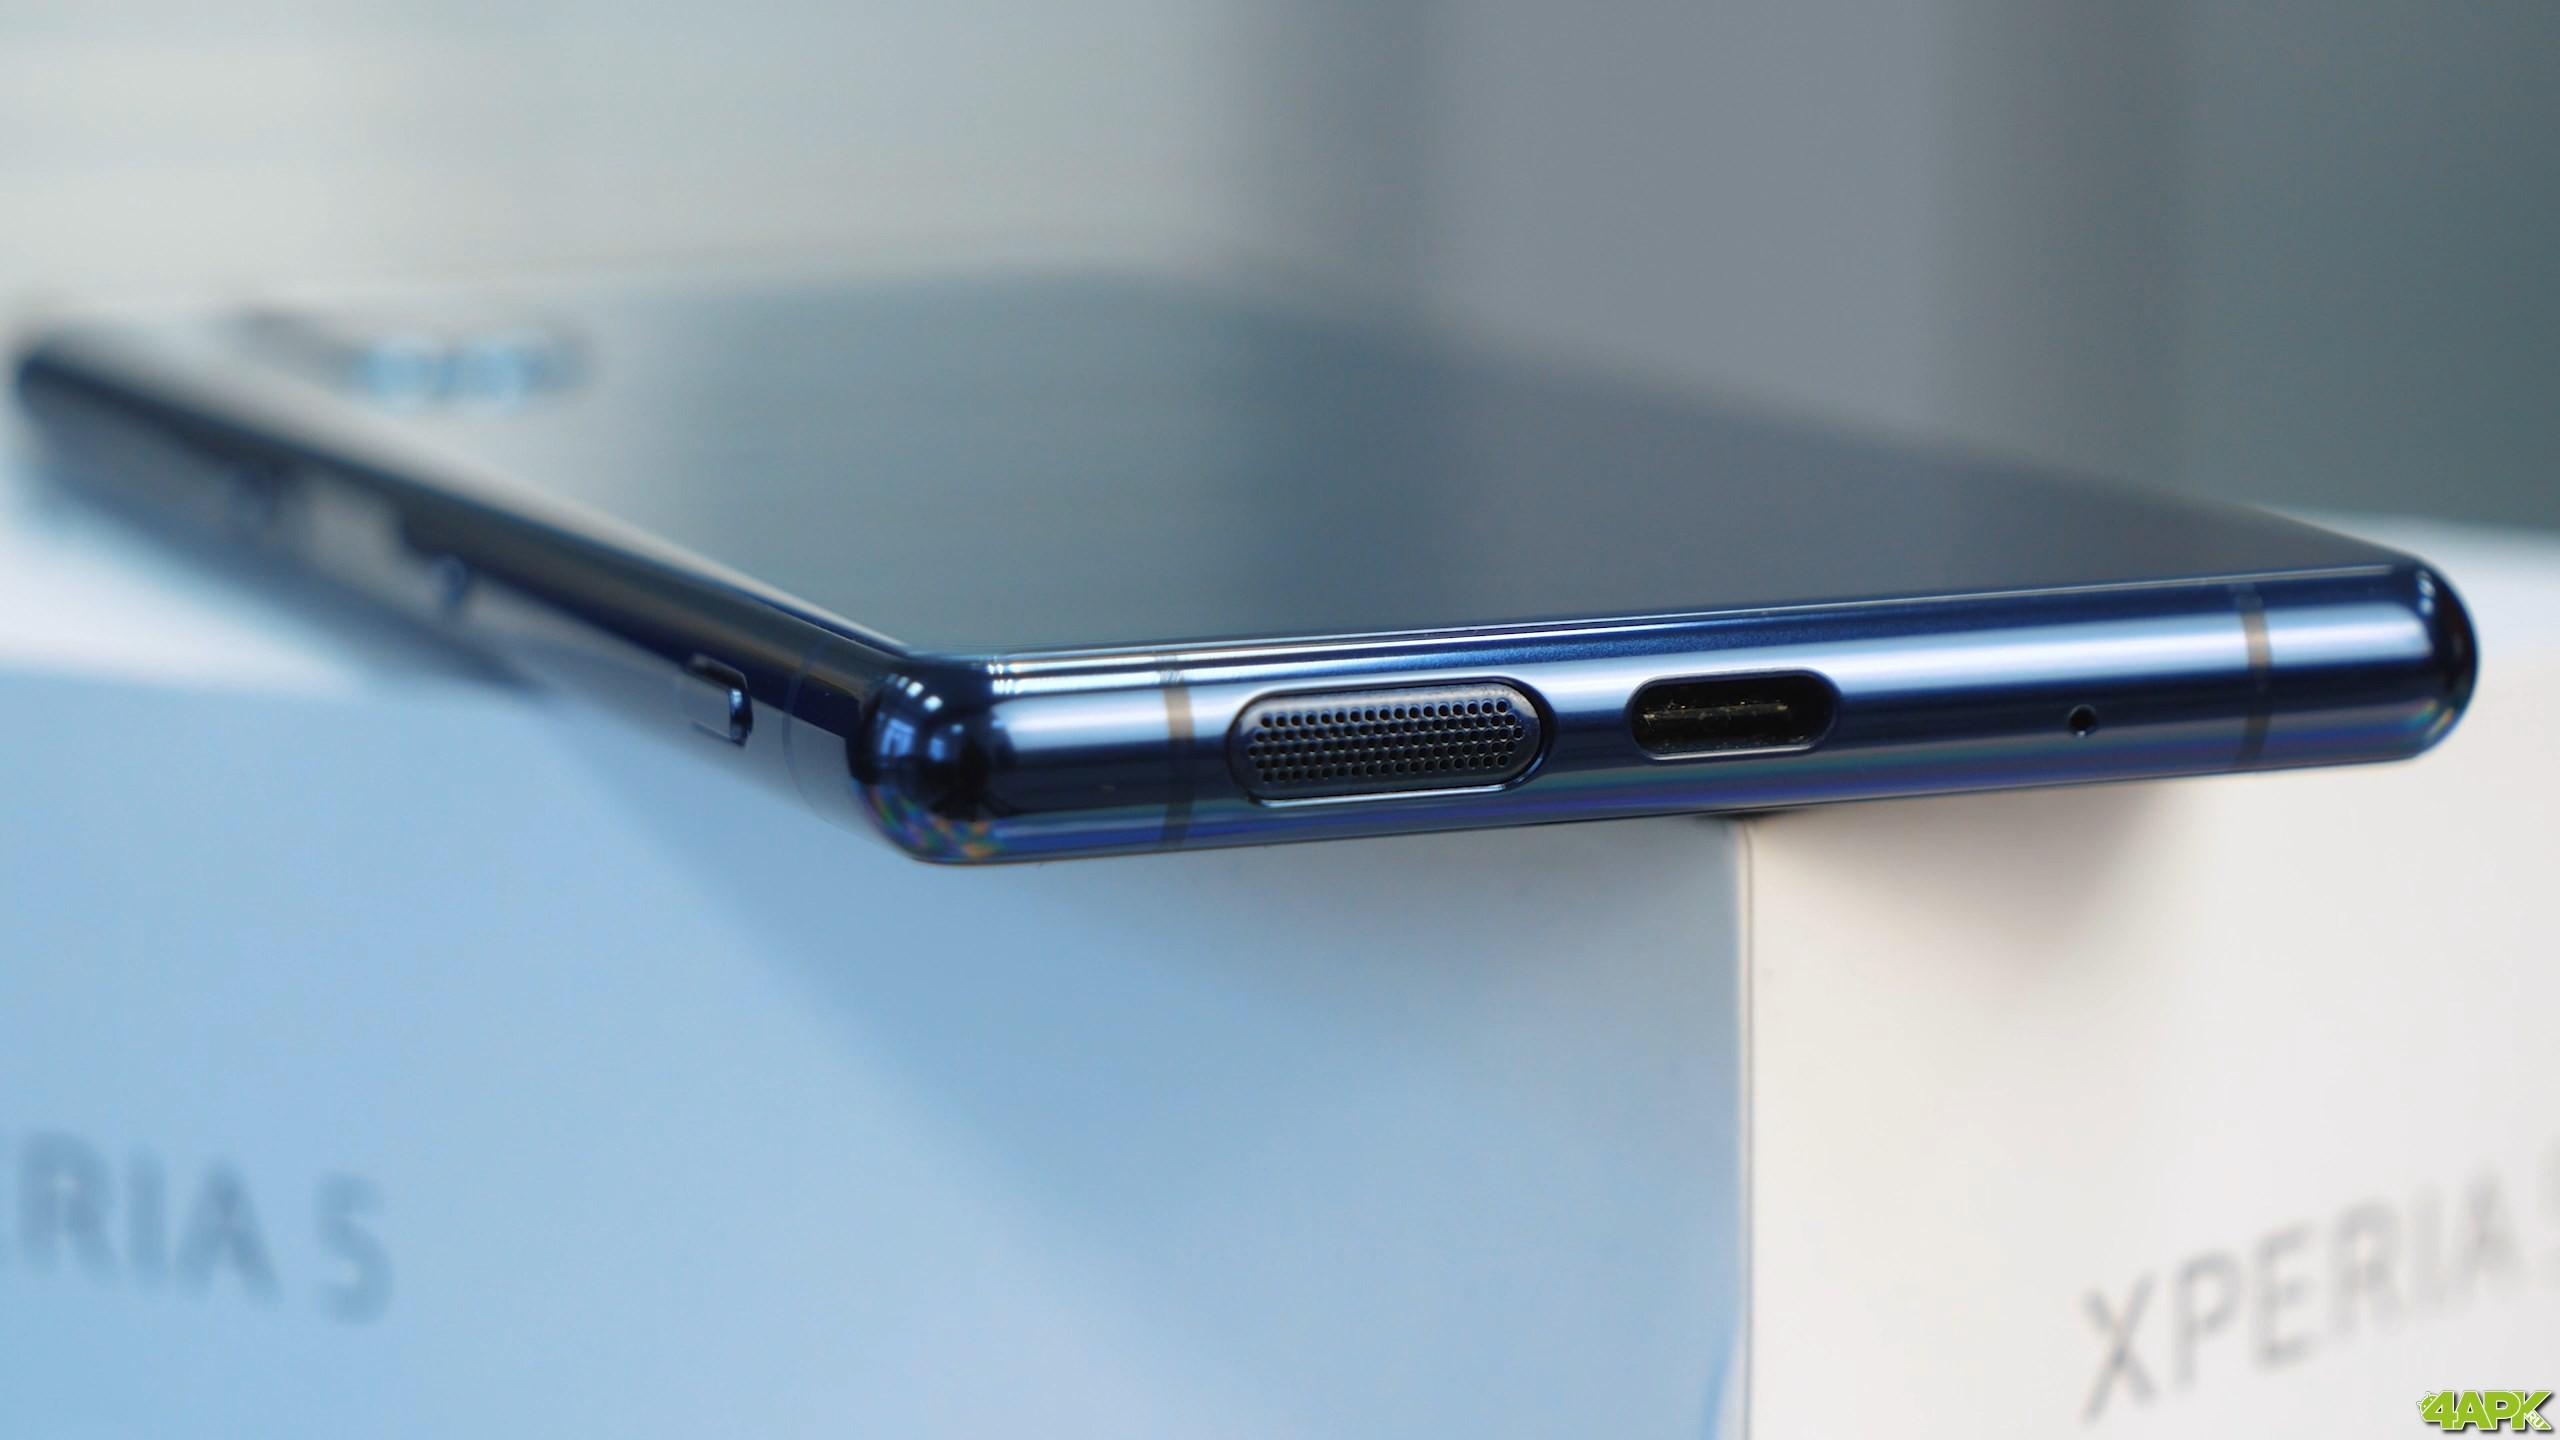 Обзор Sony Xperia 5: компактный смартфон с большим экраном Другие устройства  - obzor_sony_xperia_5_kompakt_s_bolshim_ekranom_picture50_0